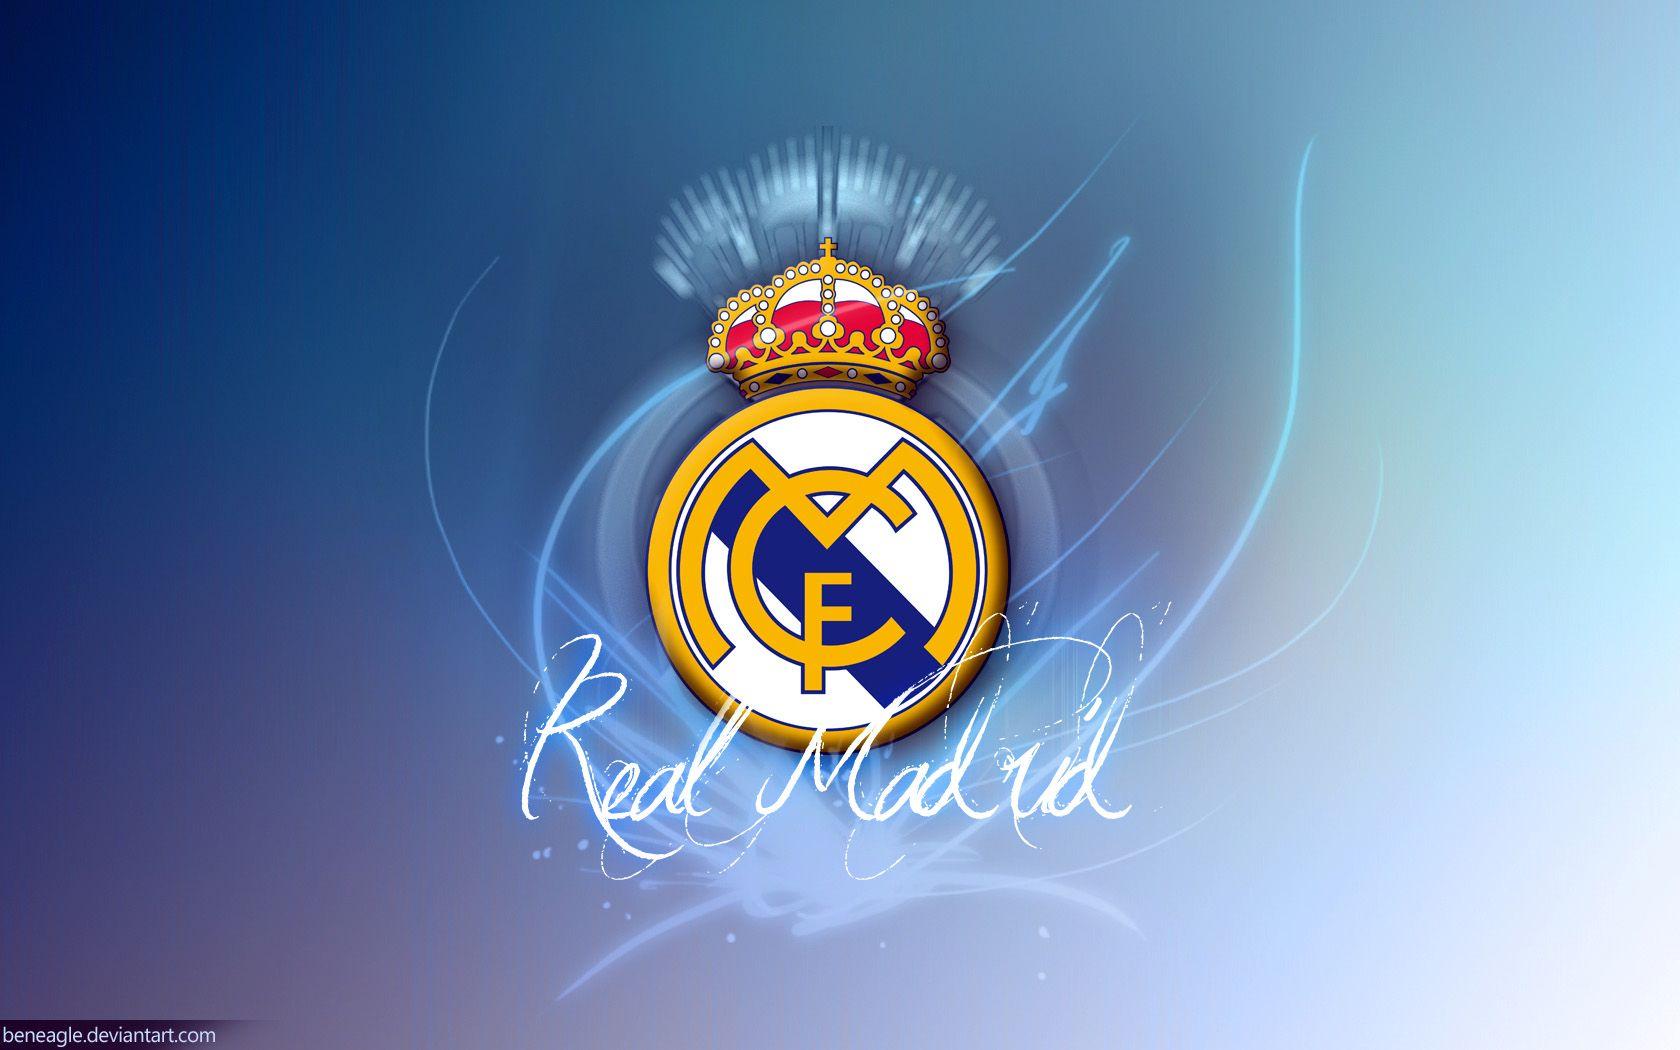 Real Madrid 10 Best Wallpaper Hd Real Madrid Logo Wallpapers Real Madrid Logo Real Madrid Wallpapers